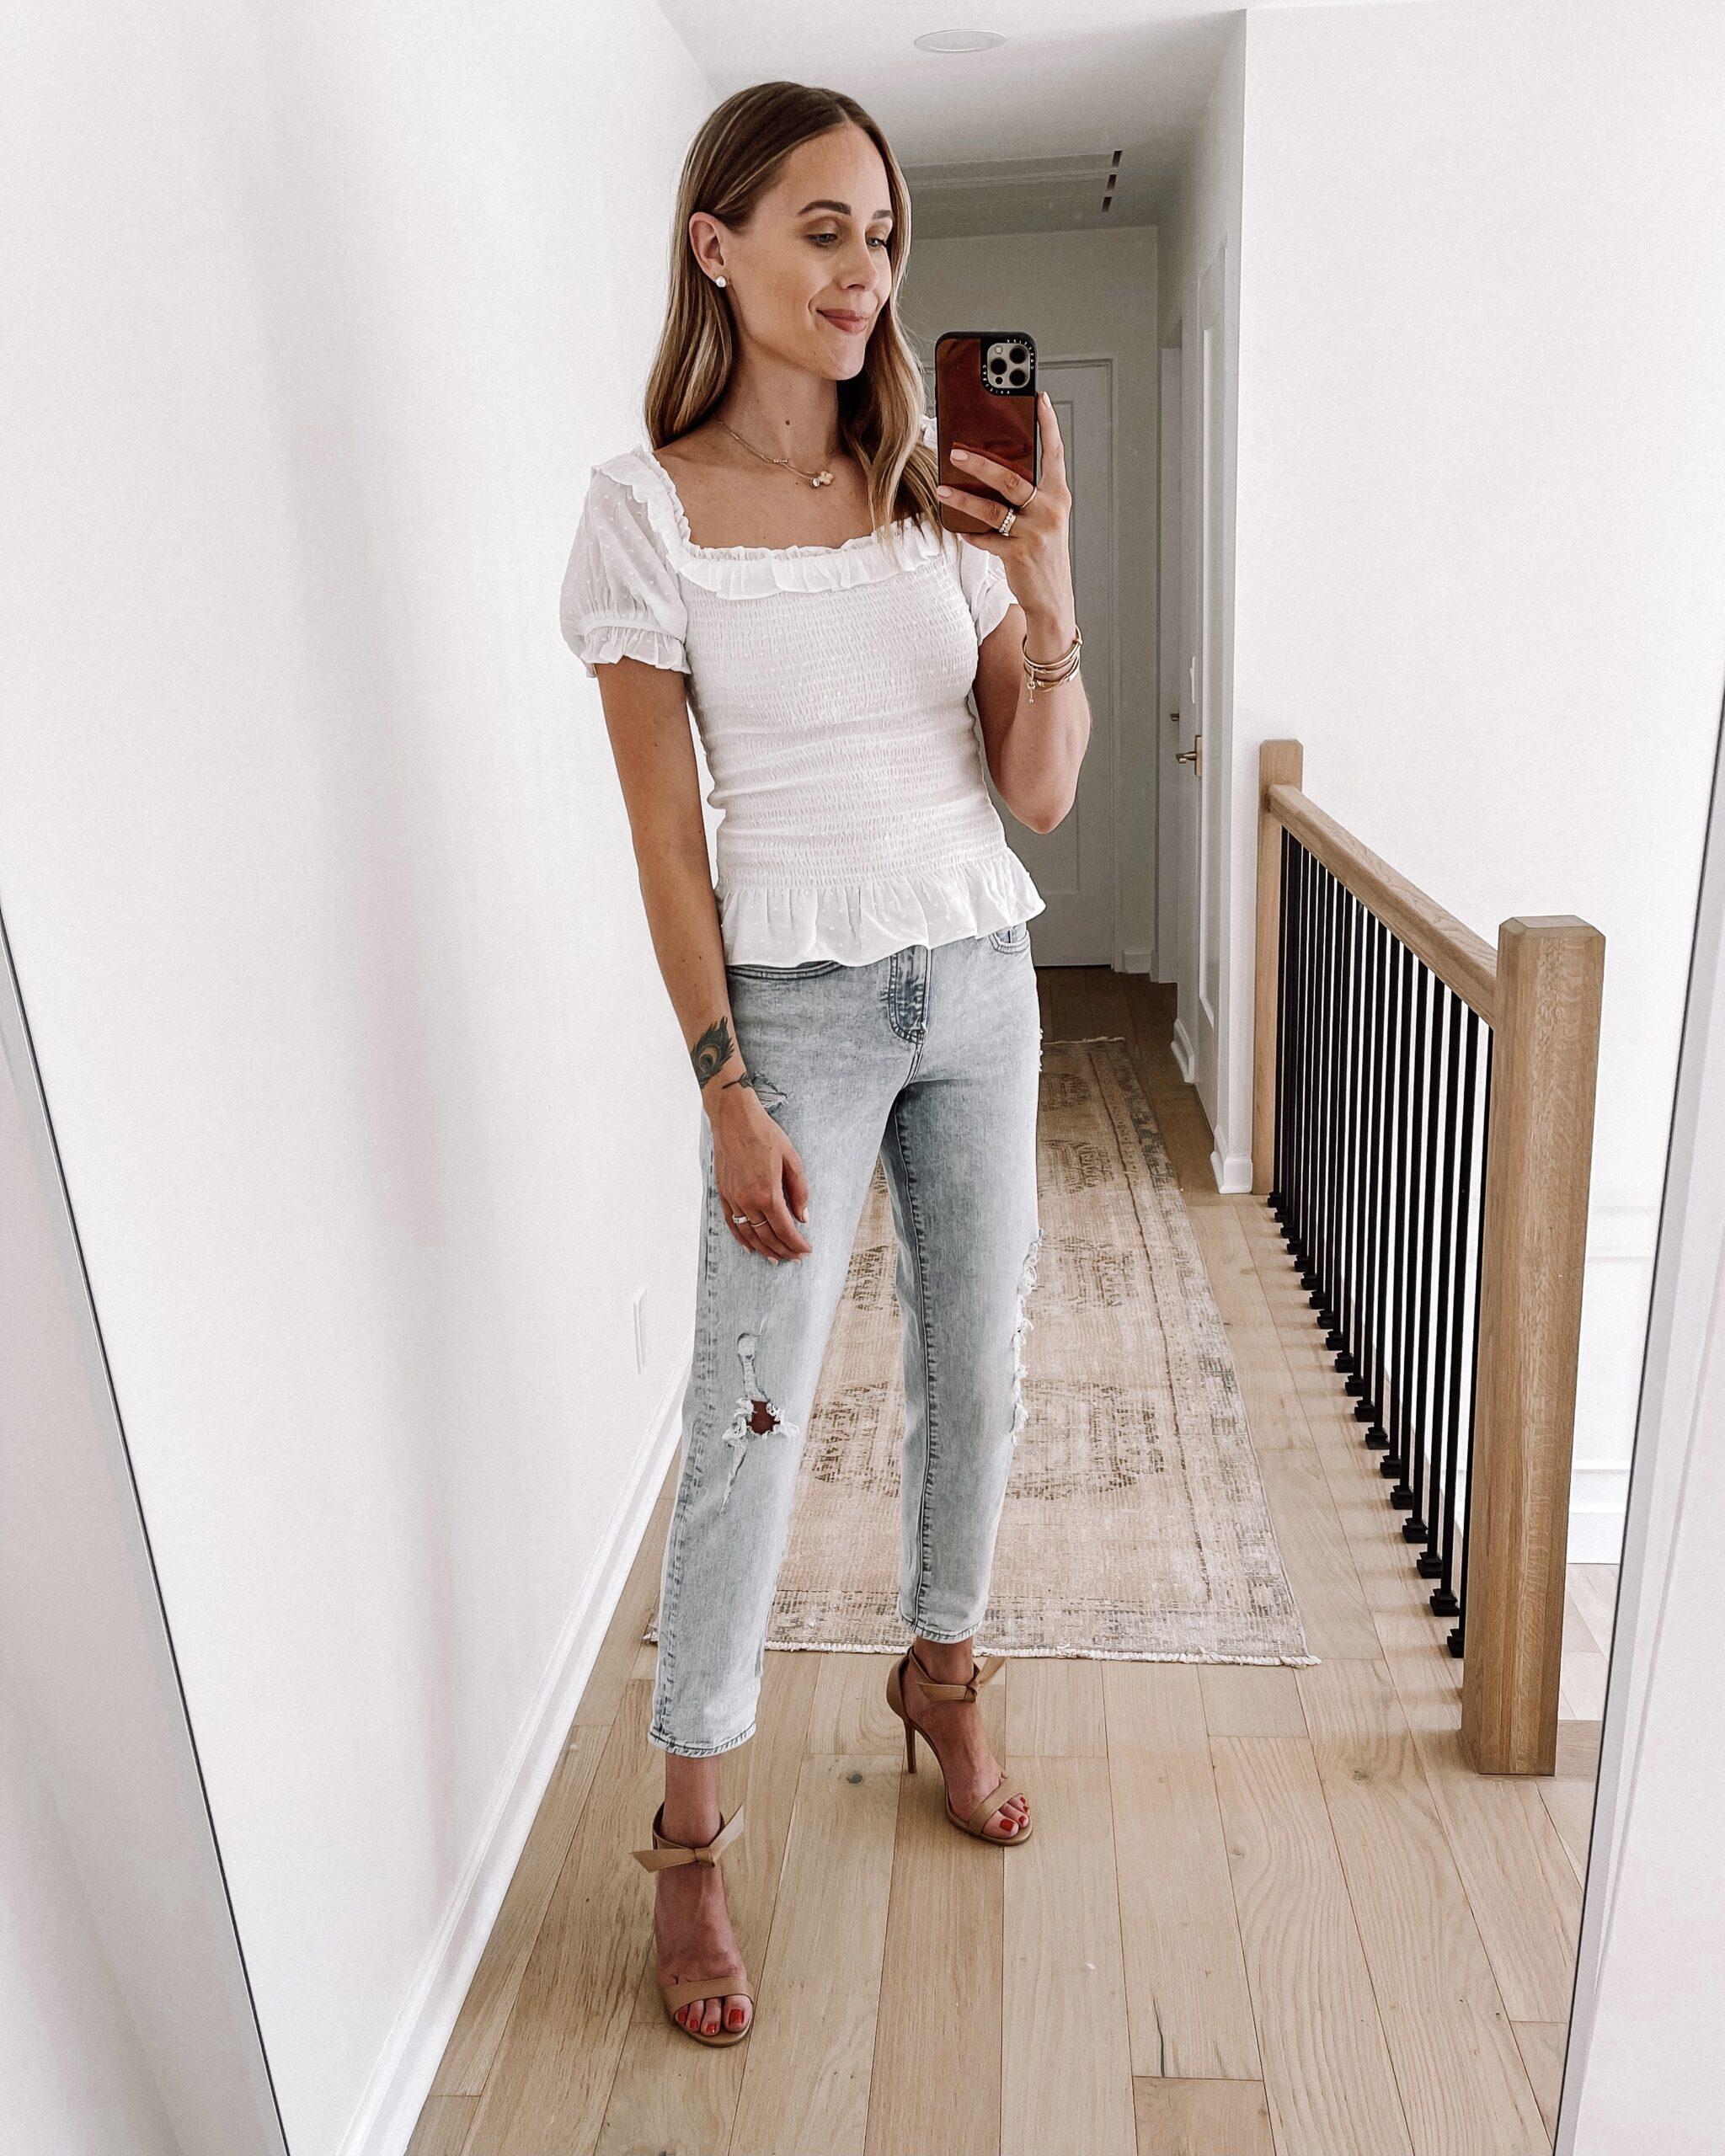 Fashion Jackson Wearing Express Distressed Boyfriend Jeans White Smocked Top Tan Heeled Sandals